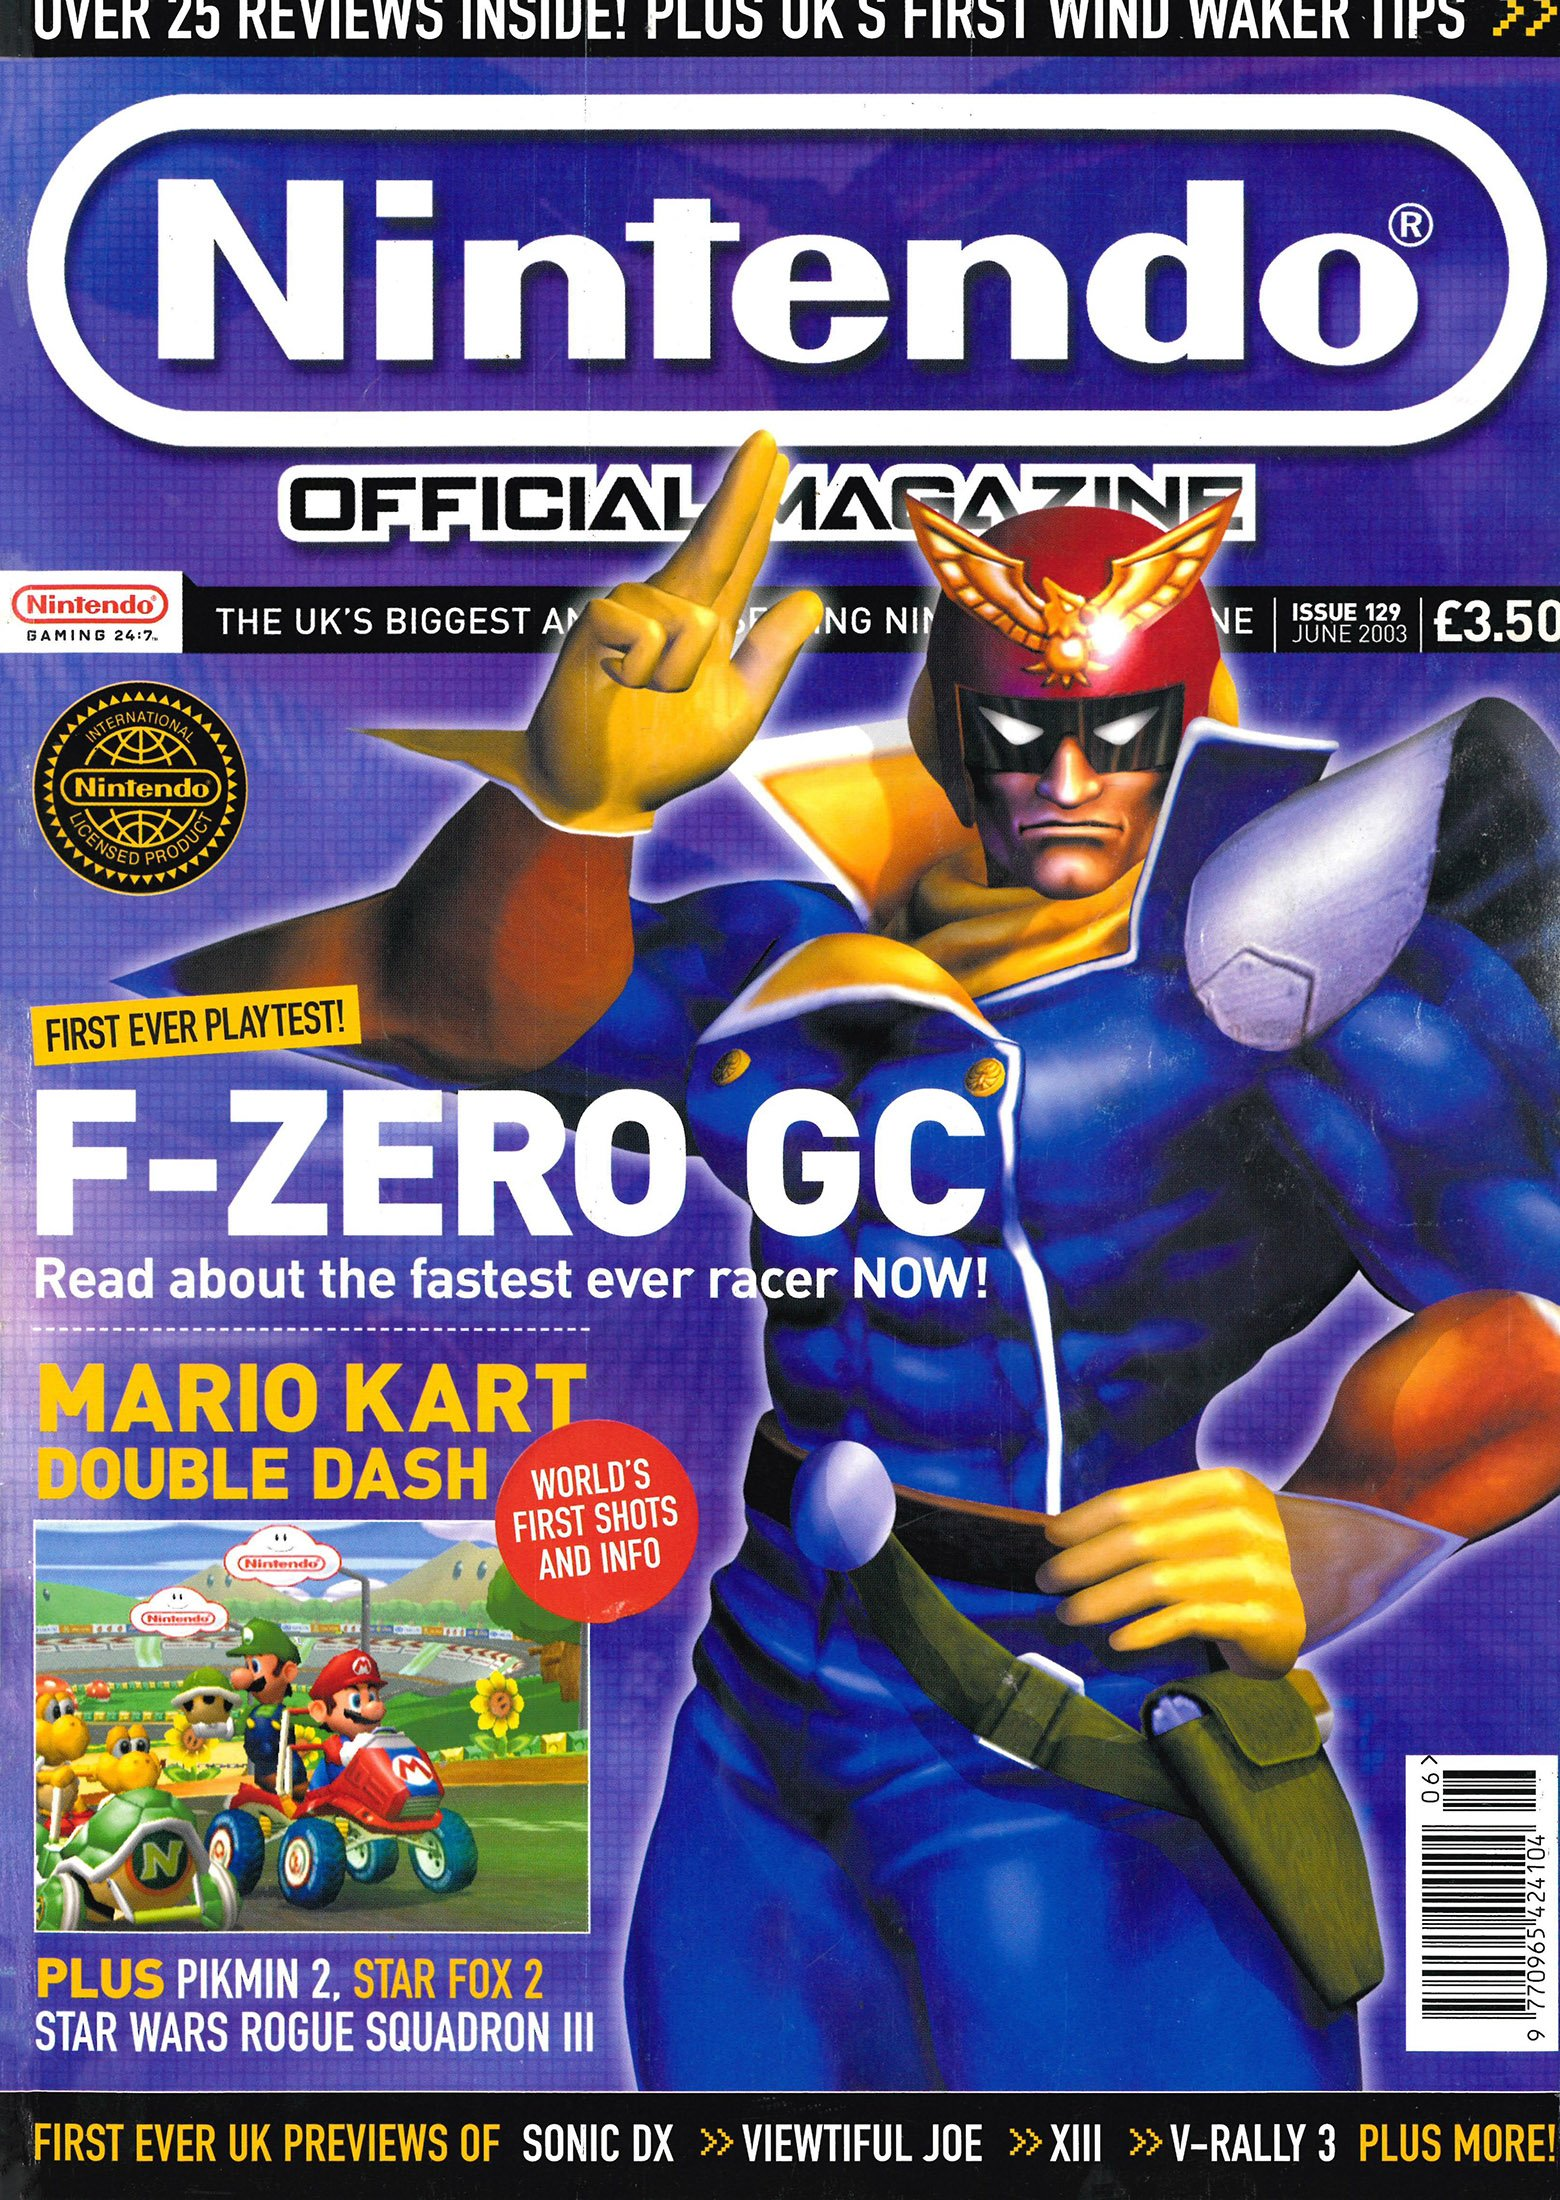 Nintendo Official Magazine 129 (June 2003)